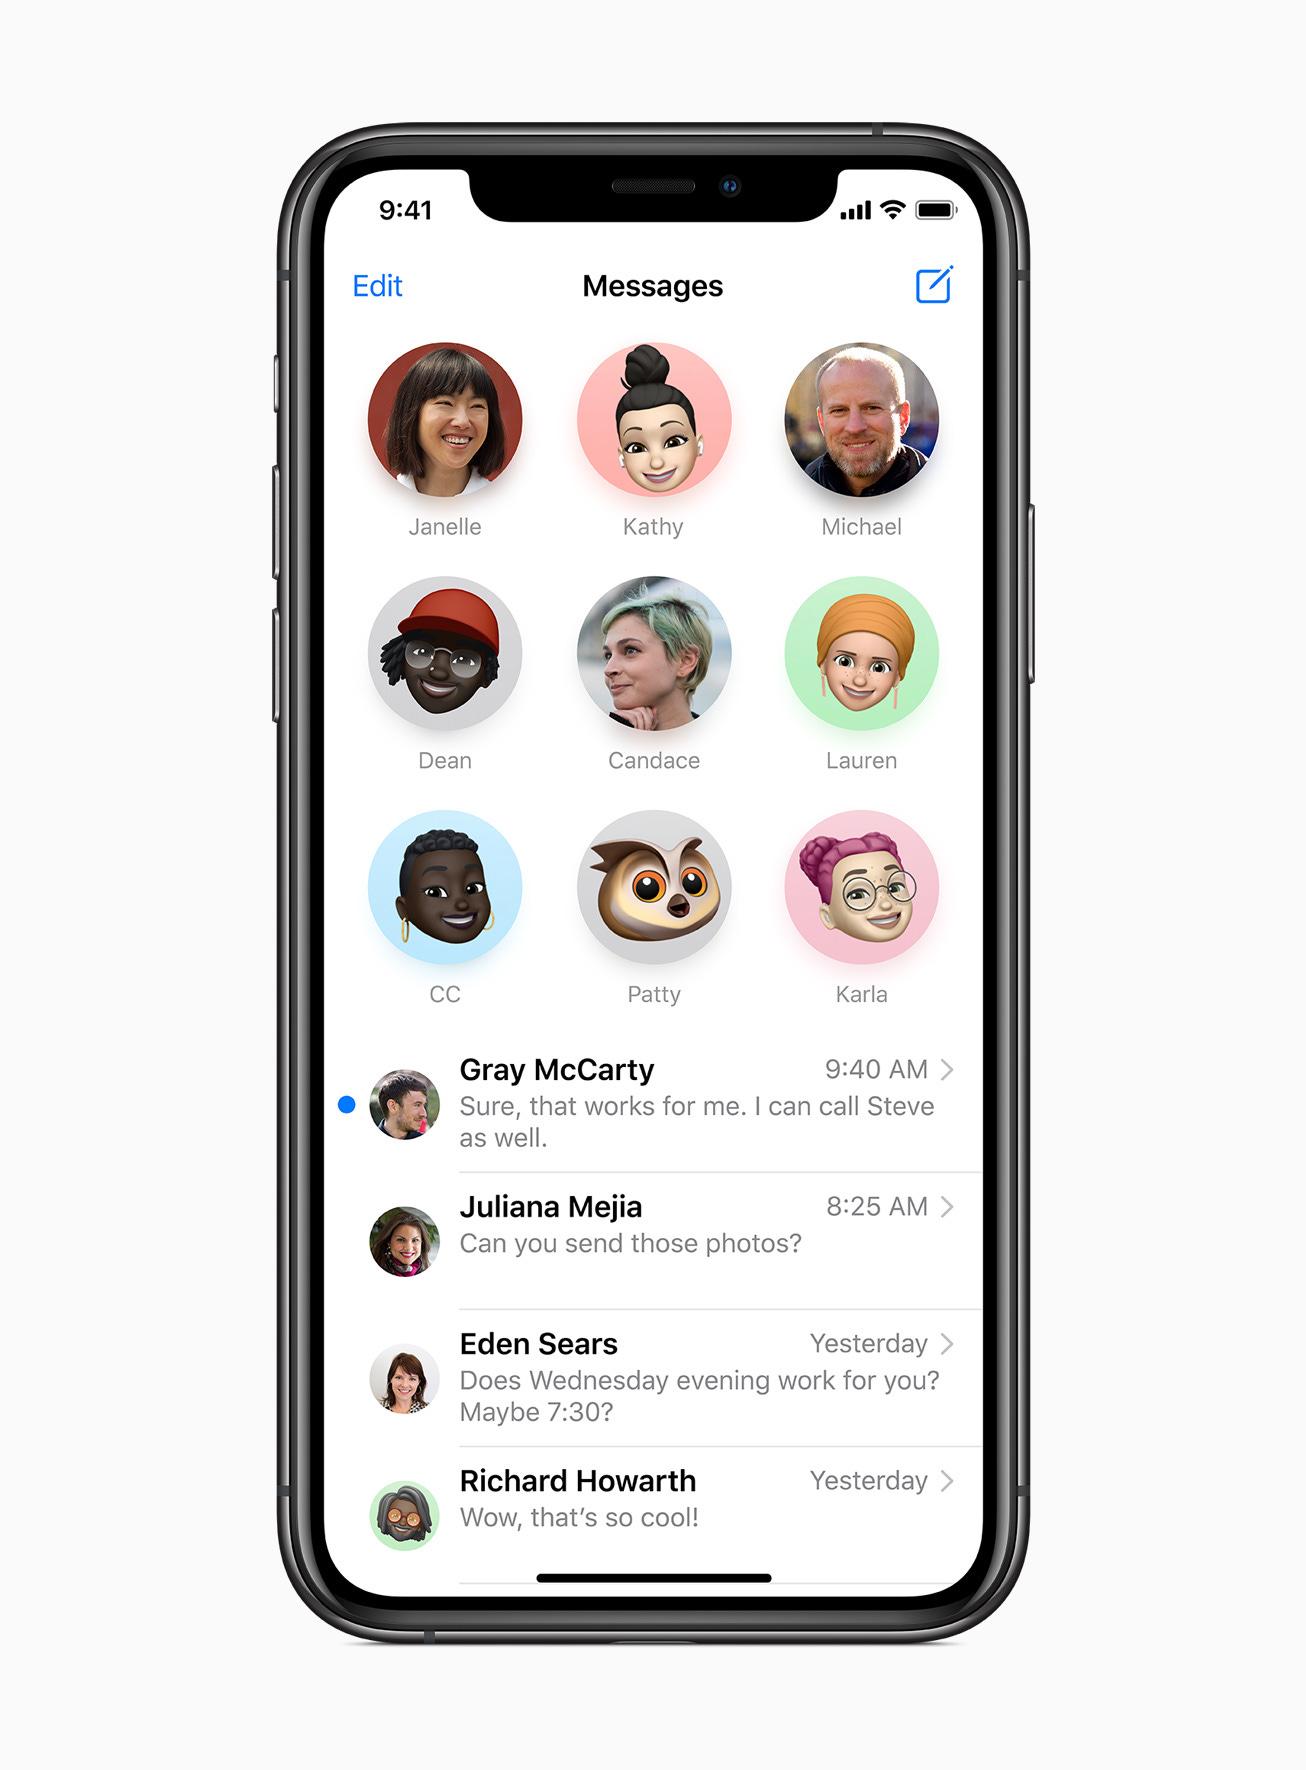 Apple_ios14-pin-conversations-messages-screen_06222020_carousel.jpg.large_2x.jpg